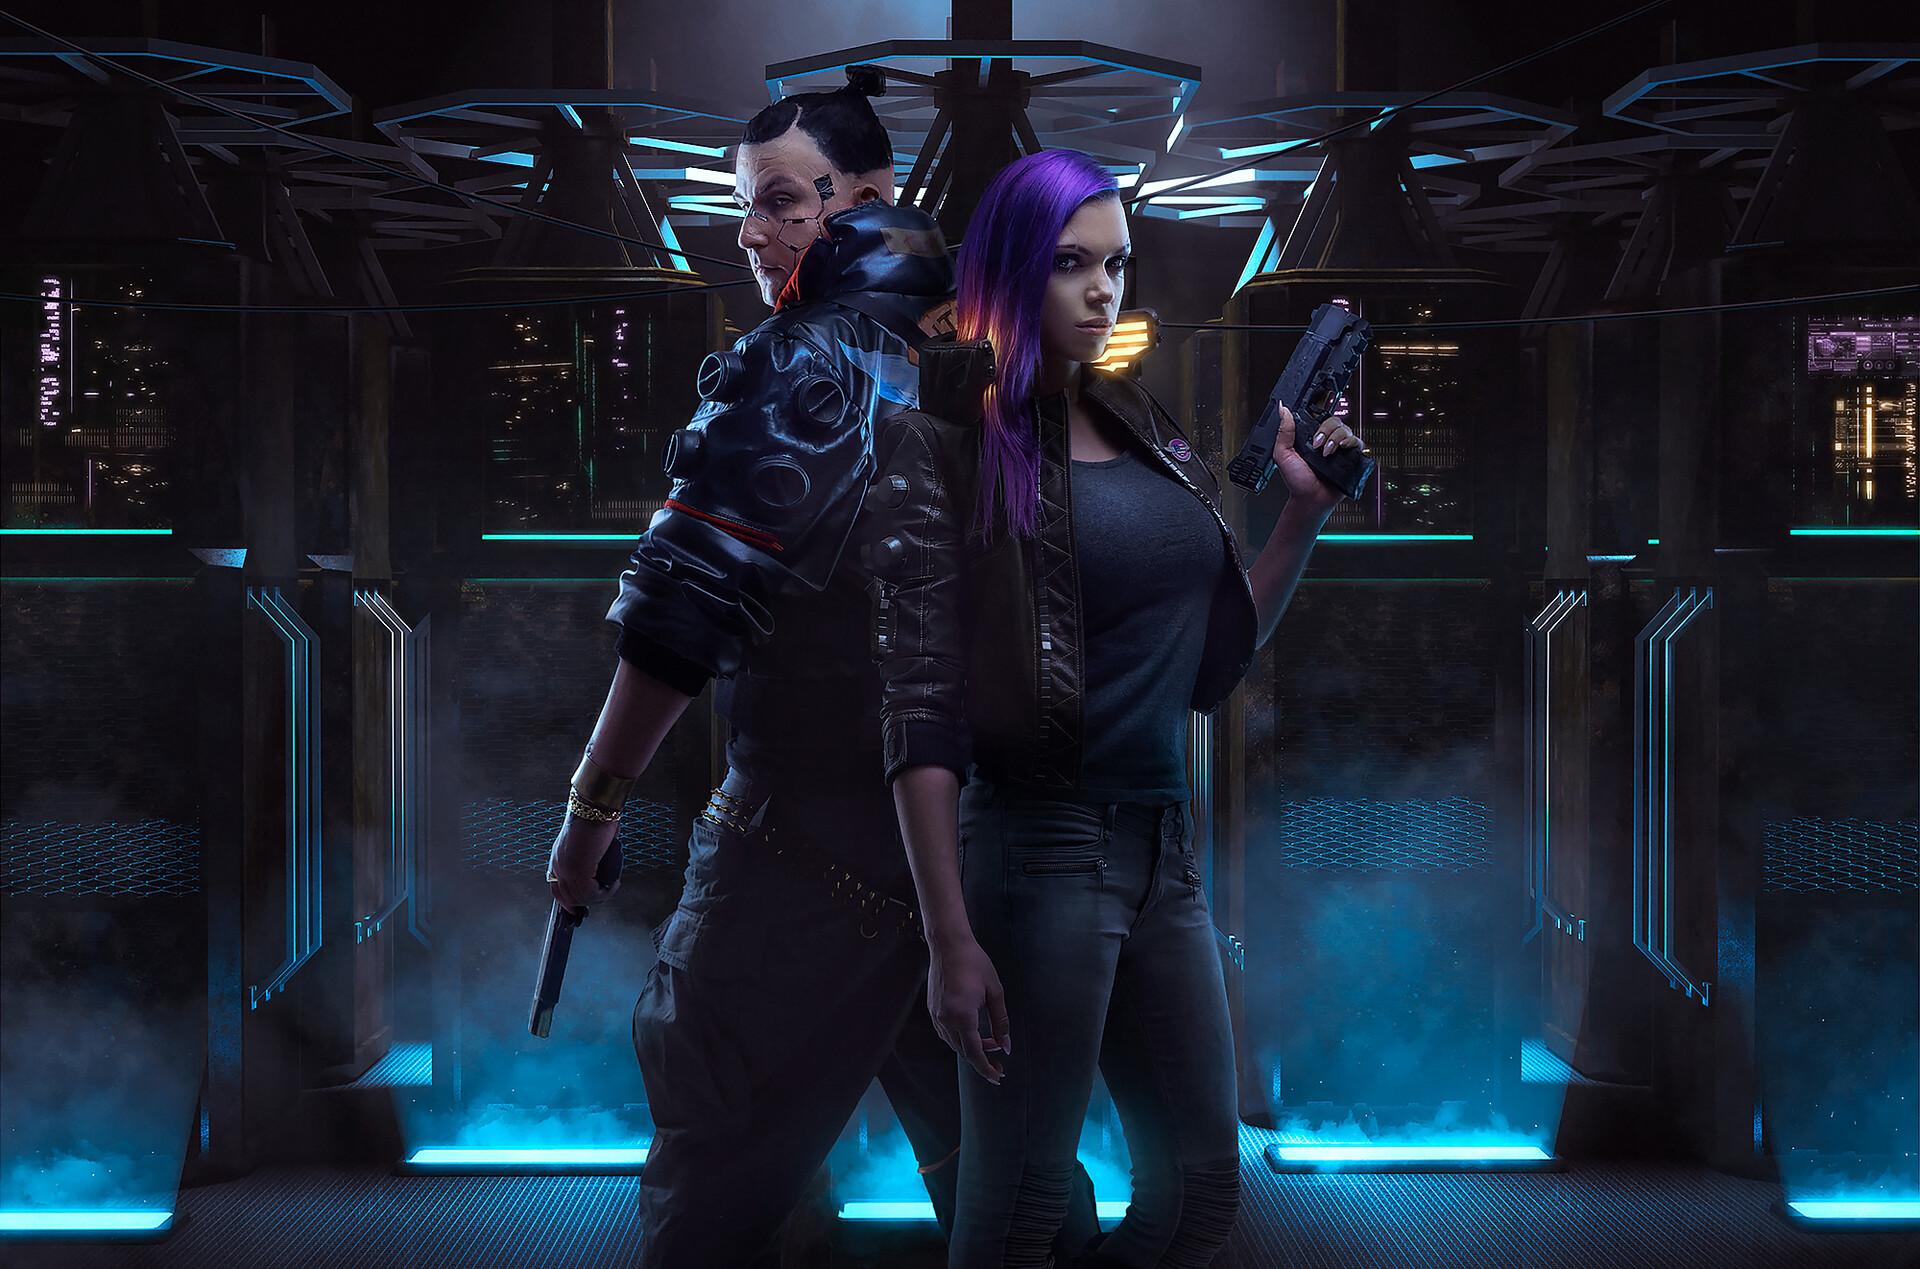 General 1920x1269 Cyberpunk 2077 cyberpunk video games science fiction cosplay Aku 悪 Octokuro futuristic